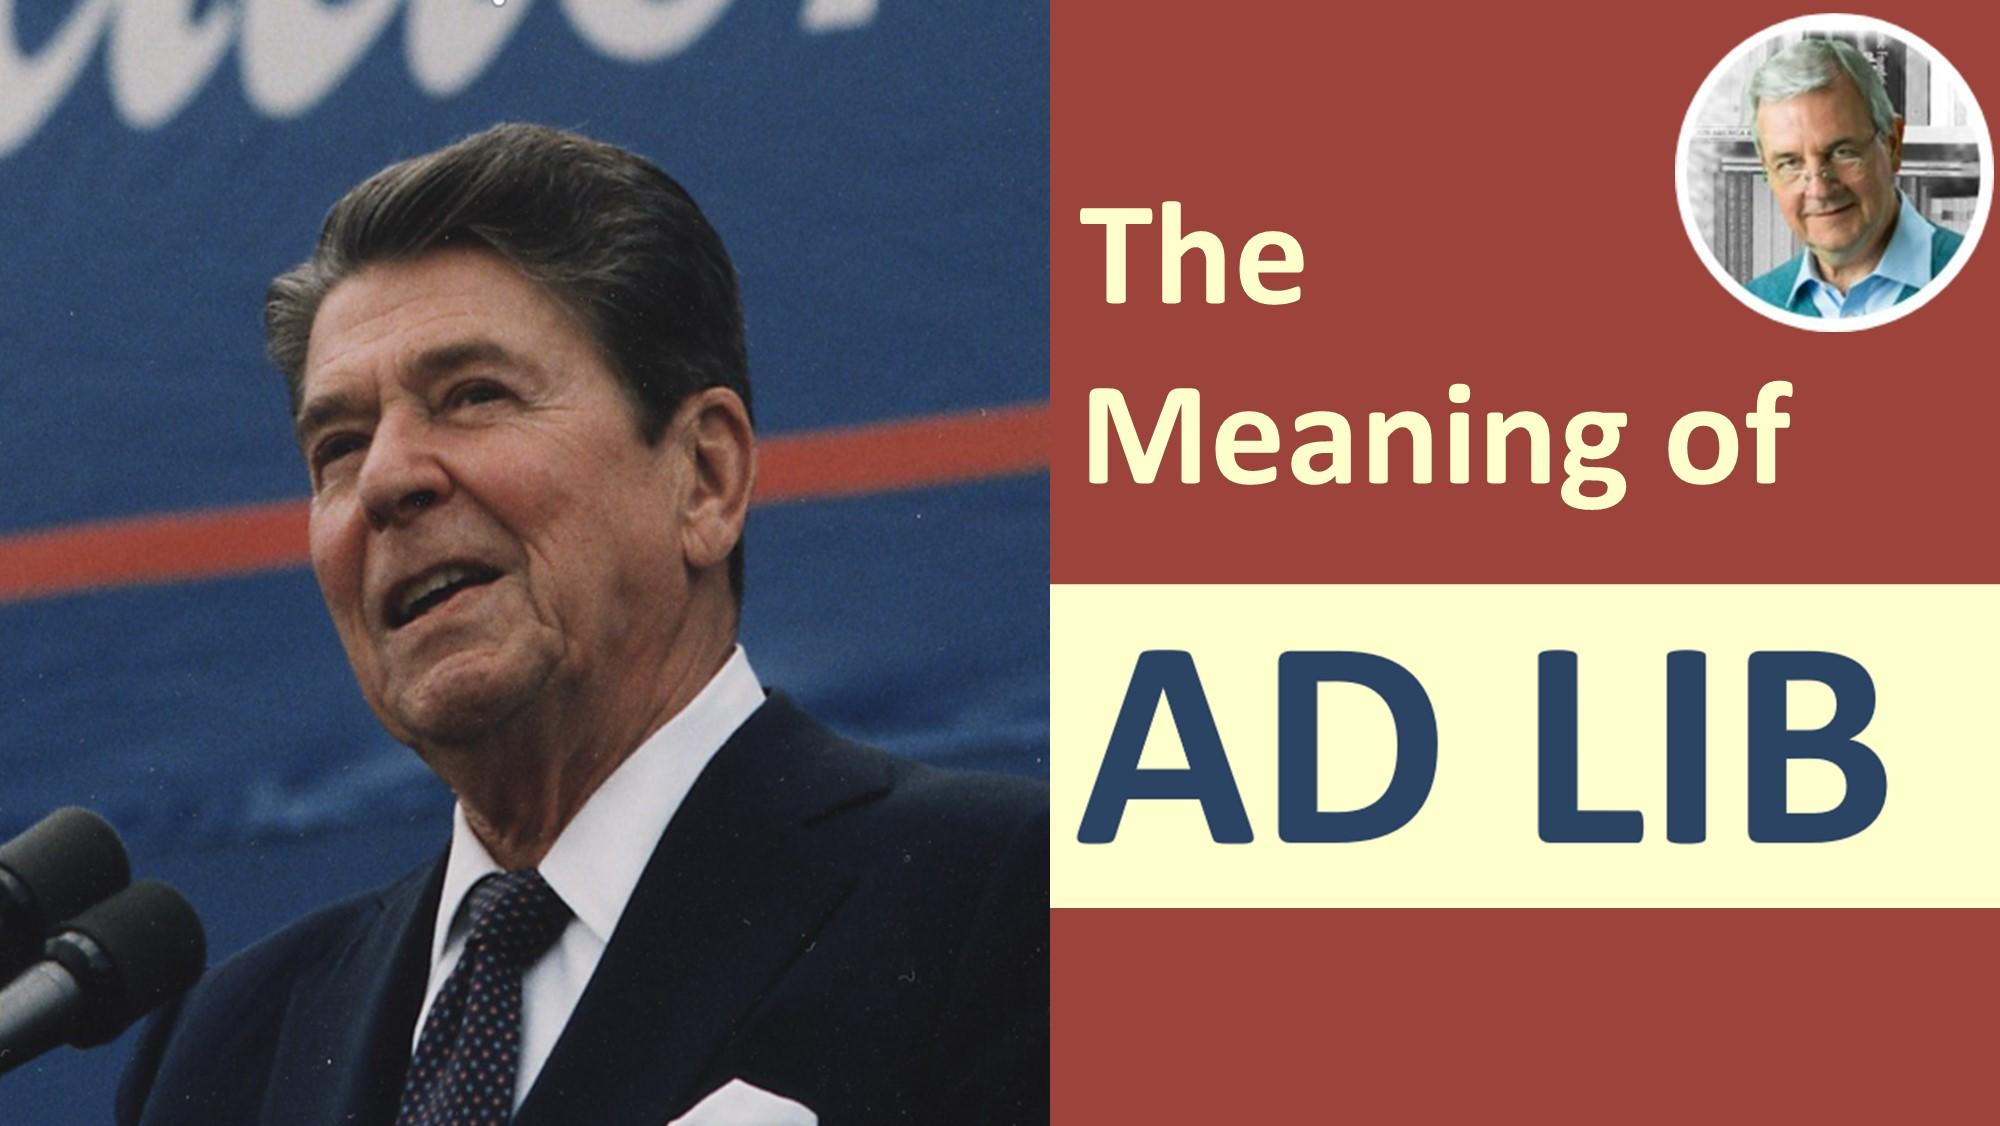 definition of ad lib